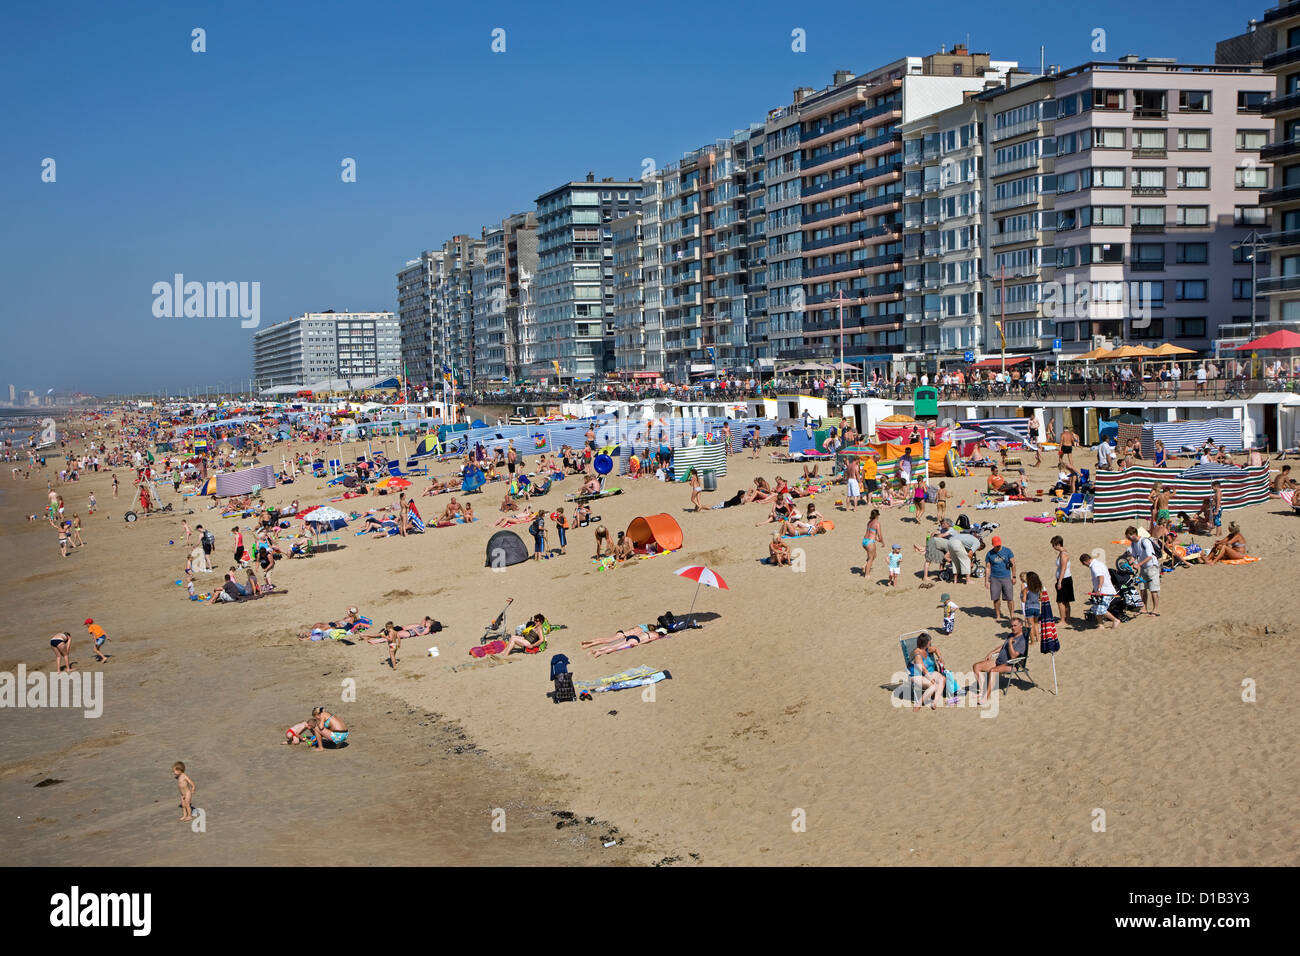 Sunbathers in summer sunning behind screens and windbreaks on beach along the North Sea coast at Belgian seaside - Stock Image